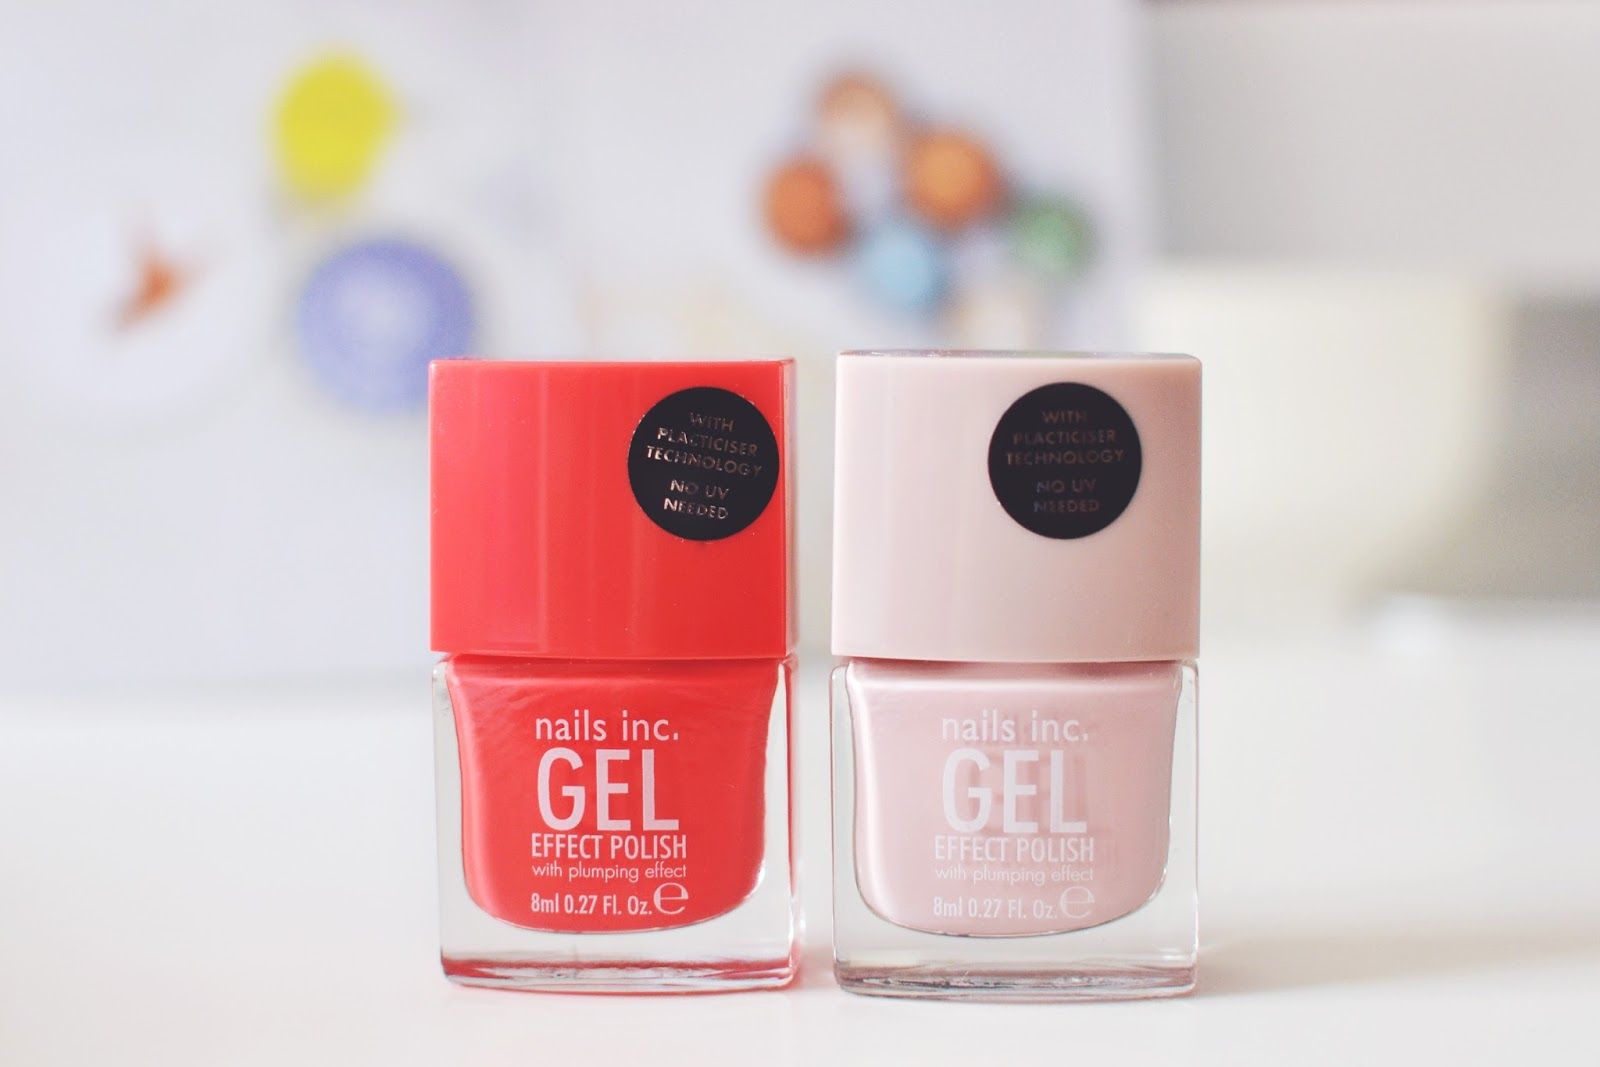 Nails inc Gel Effect Polish Review